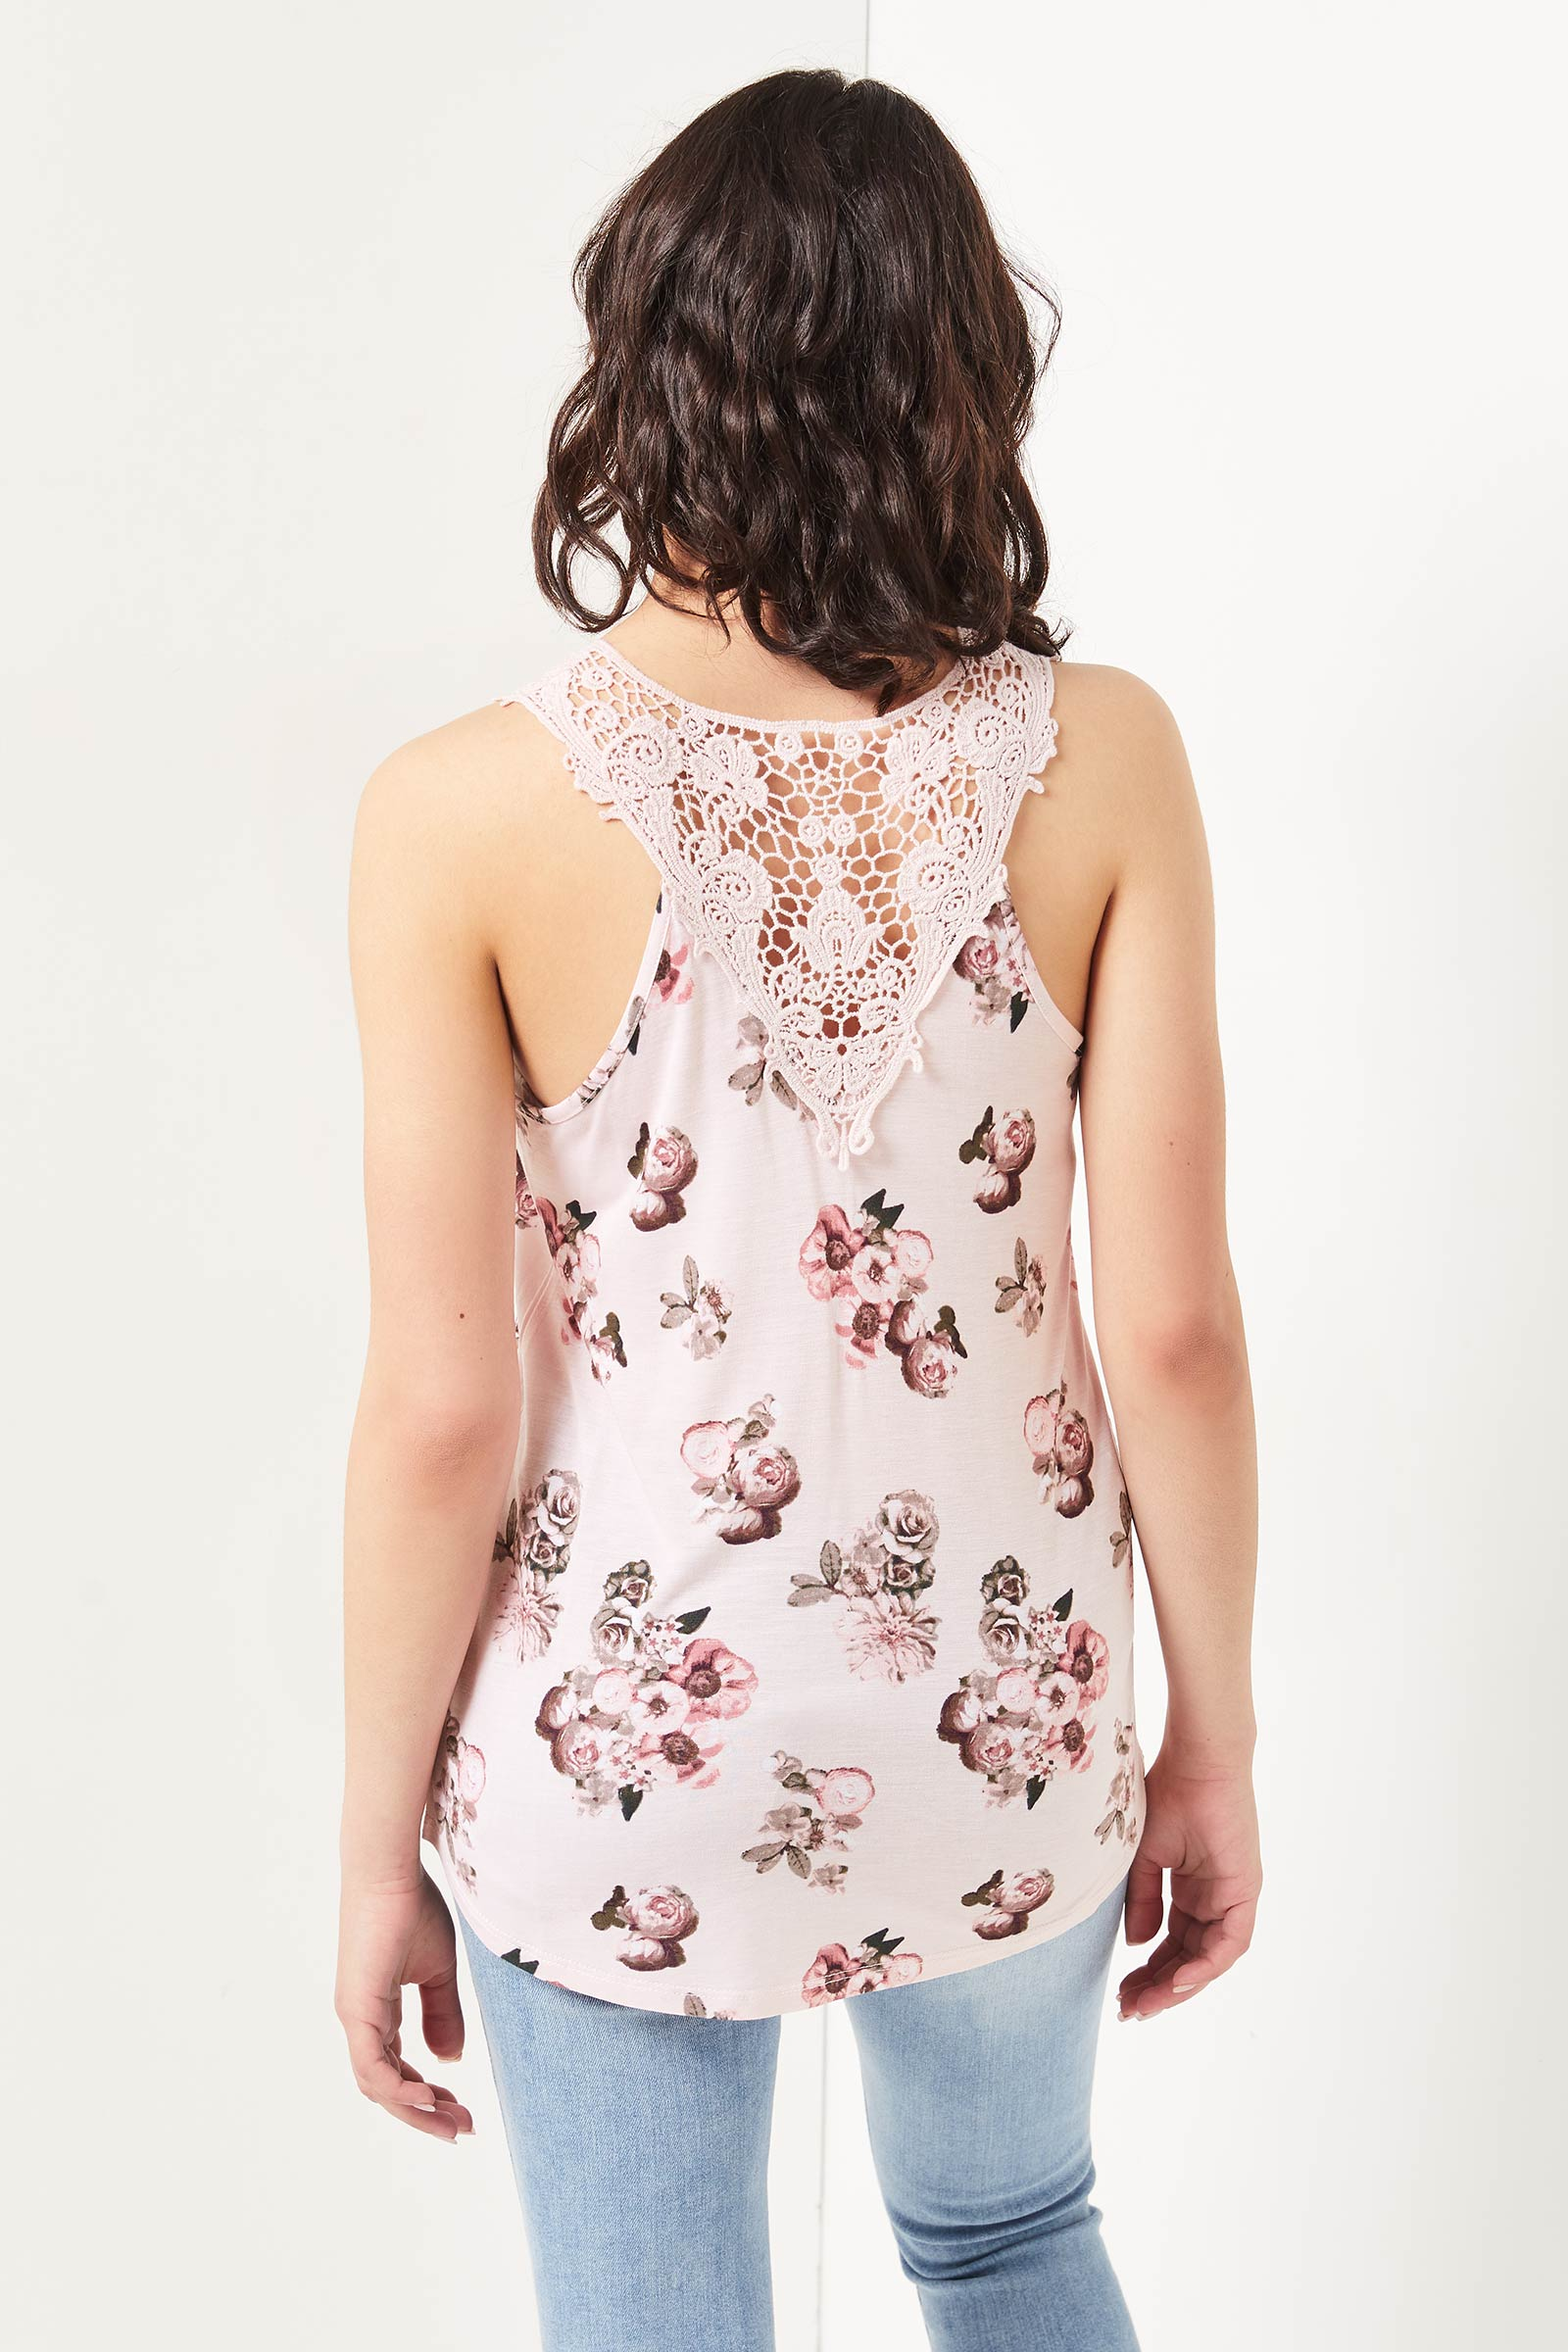 Cami longue fleurie avec dos en crochet